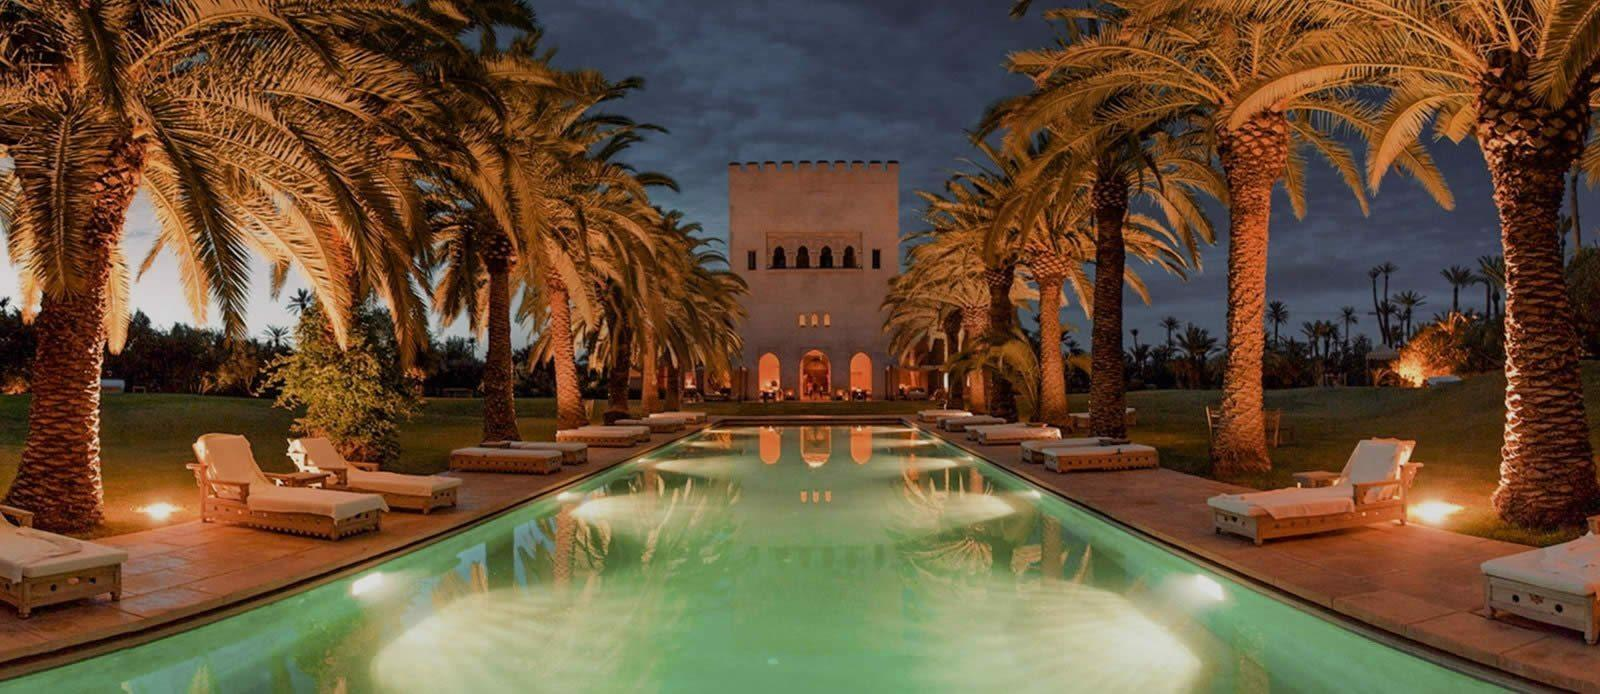 Marrakech Hotel Les Idribides